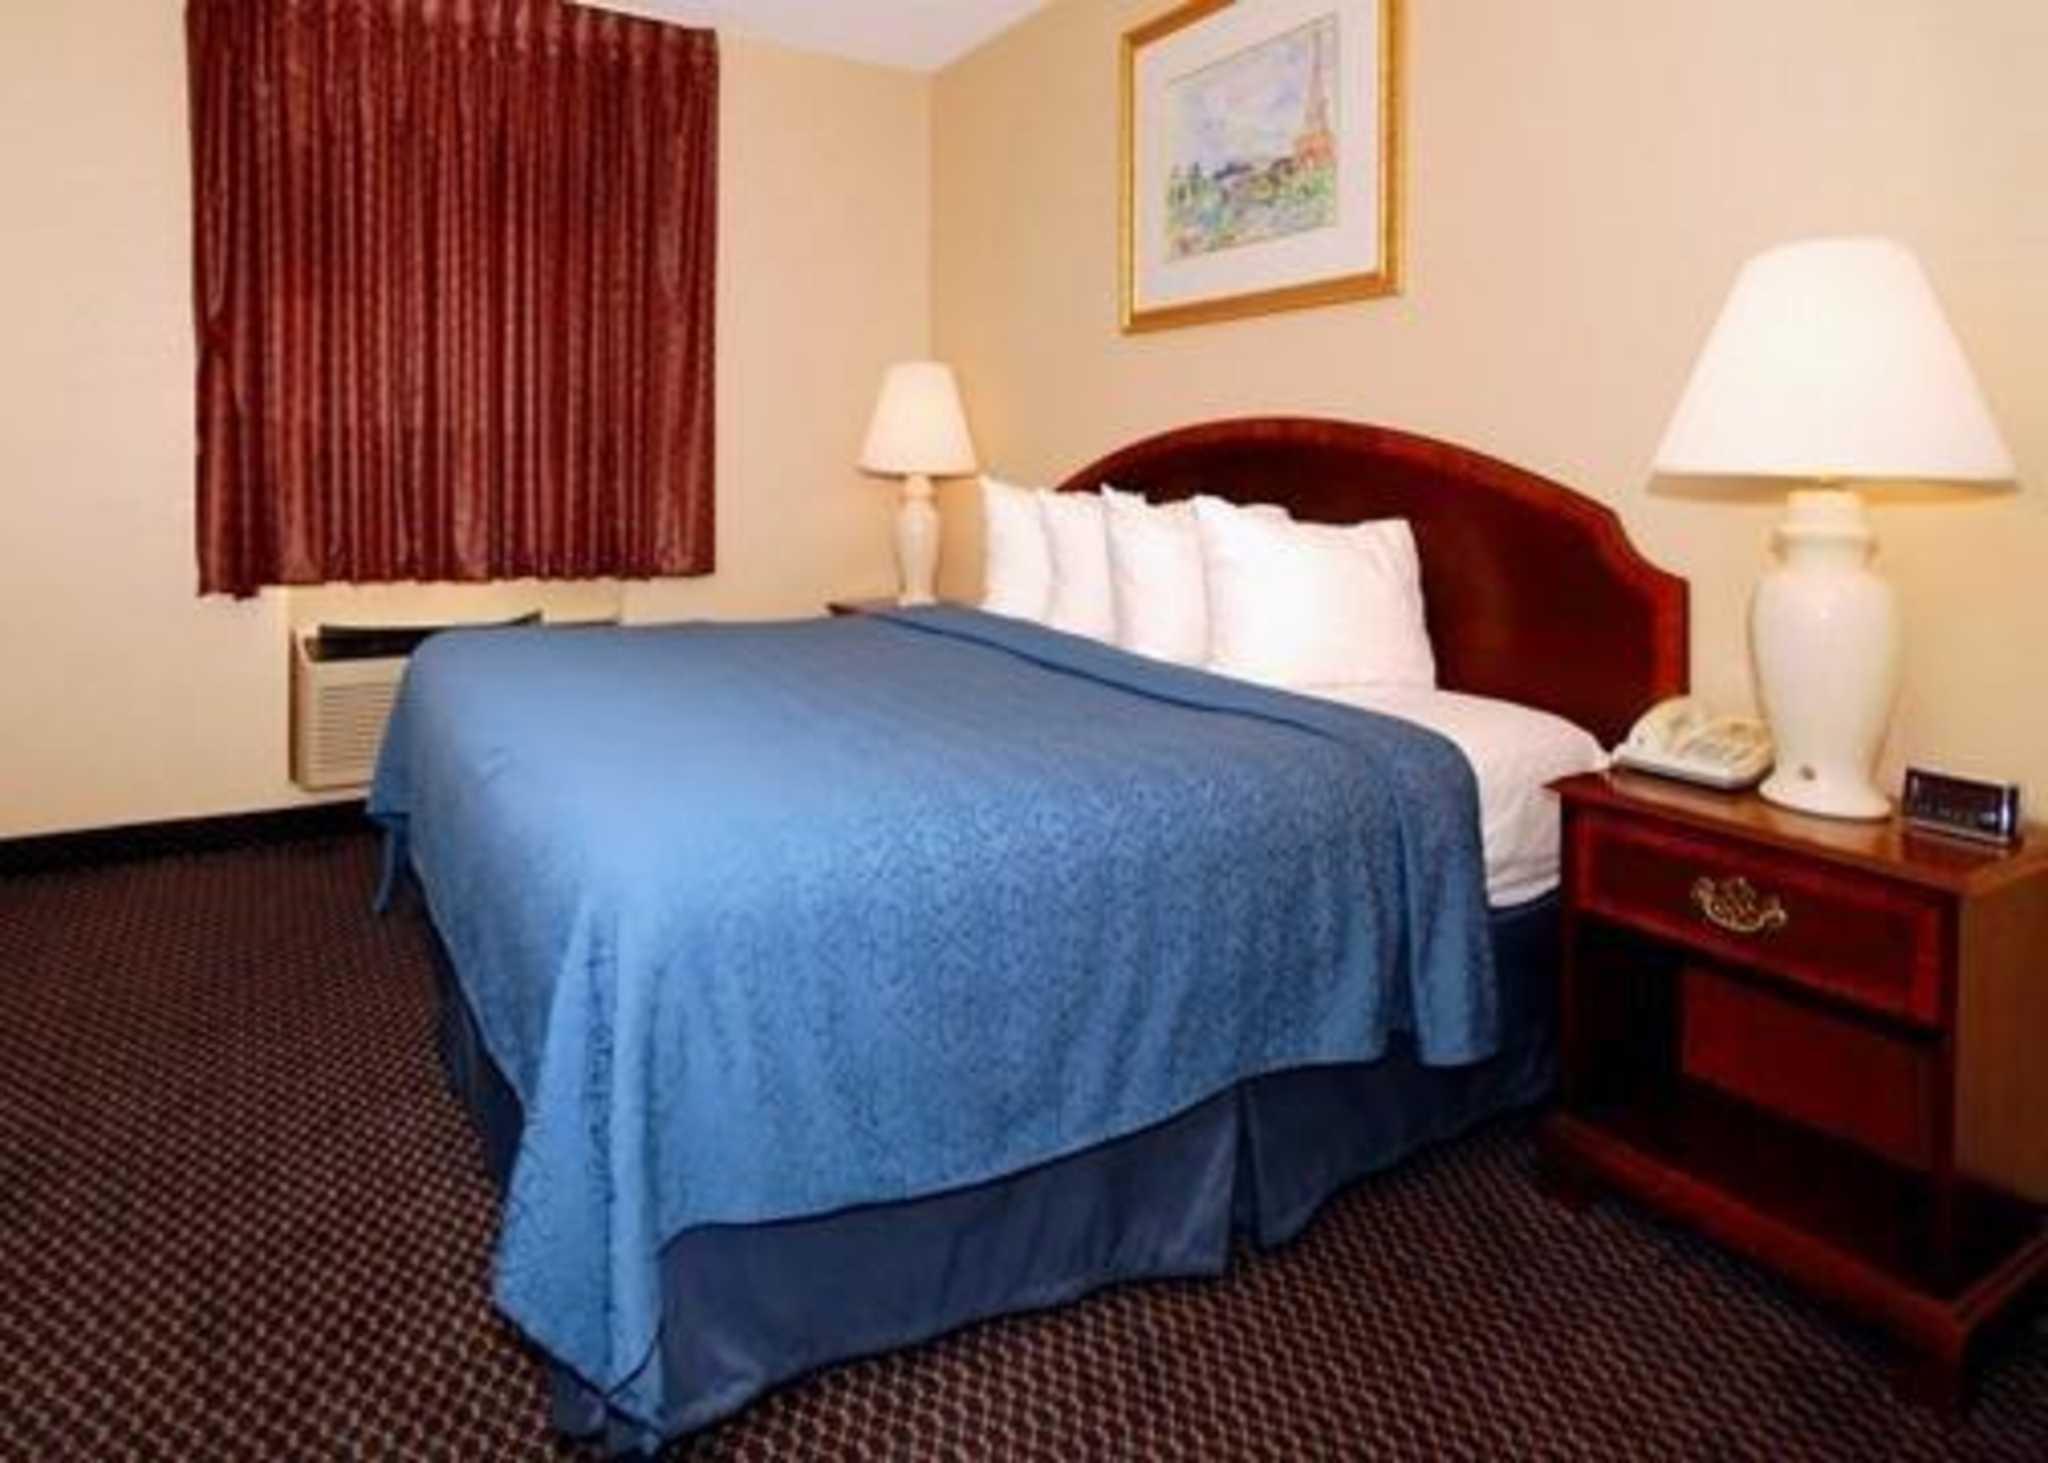 Econo Lodge Inn & Suites image 5